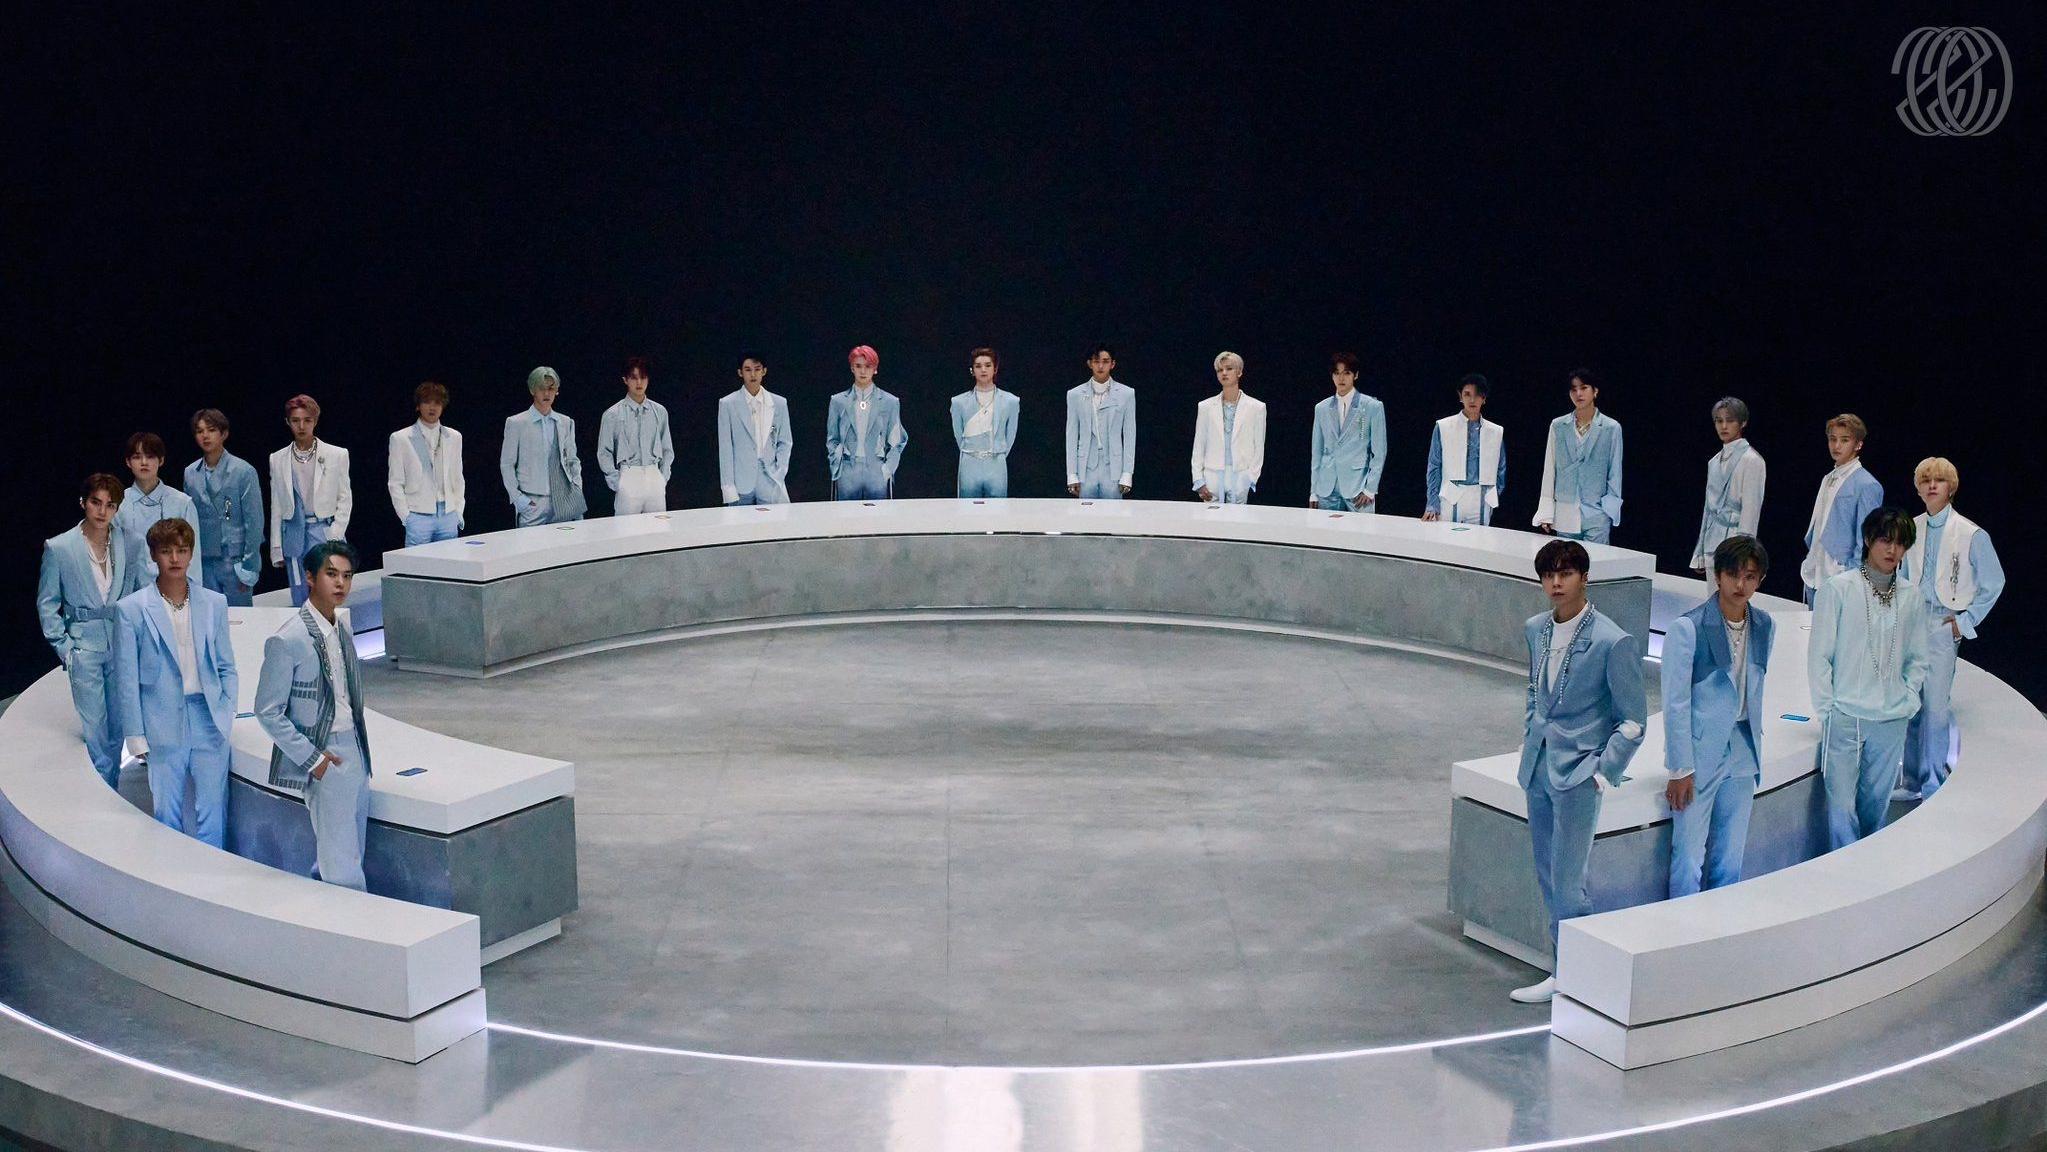 SM Leaks NCT's Comeback Track on New Album 'RESONANCE Pt. 1 '